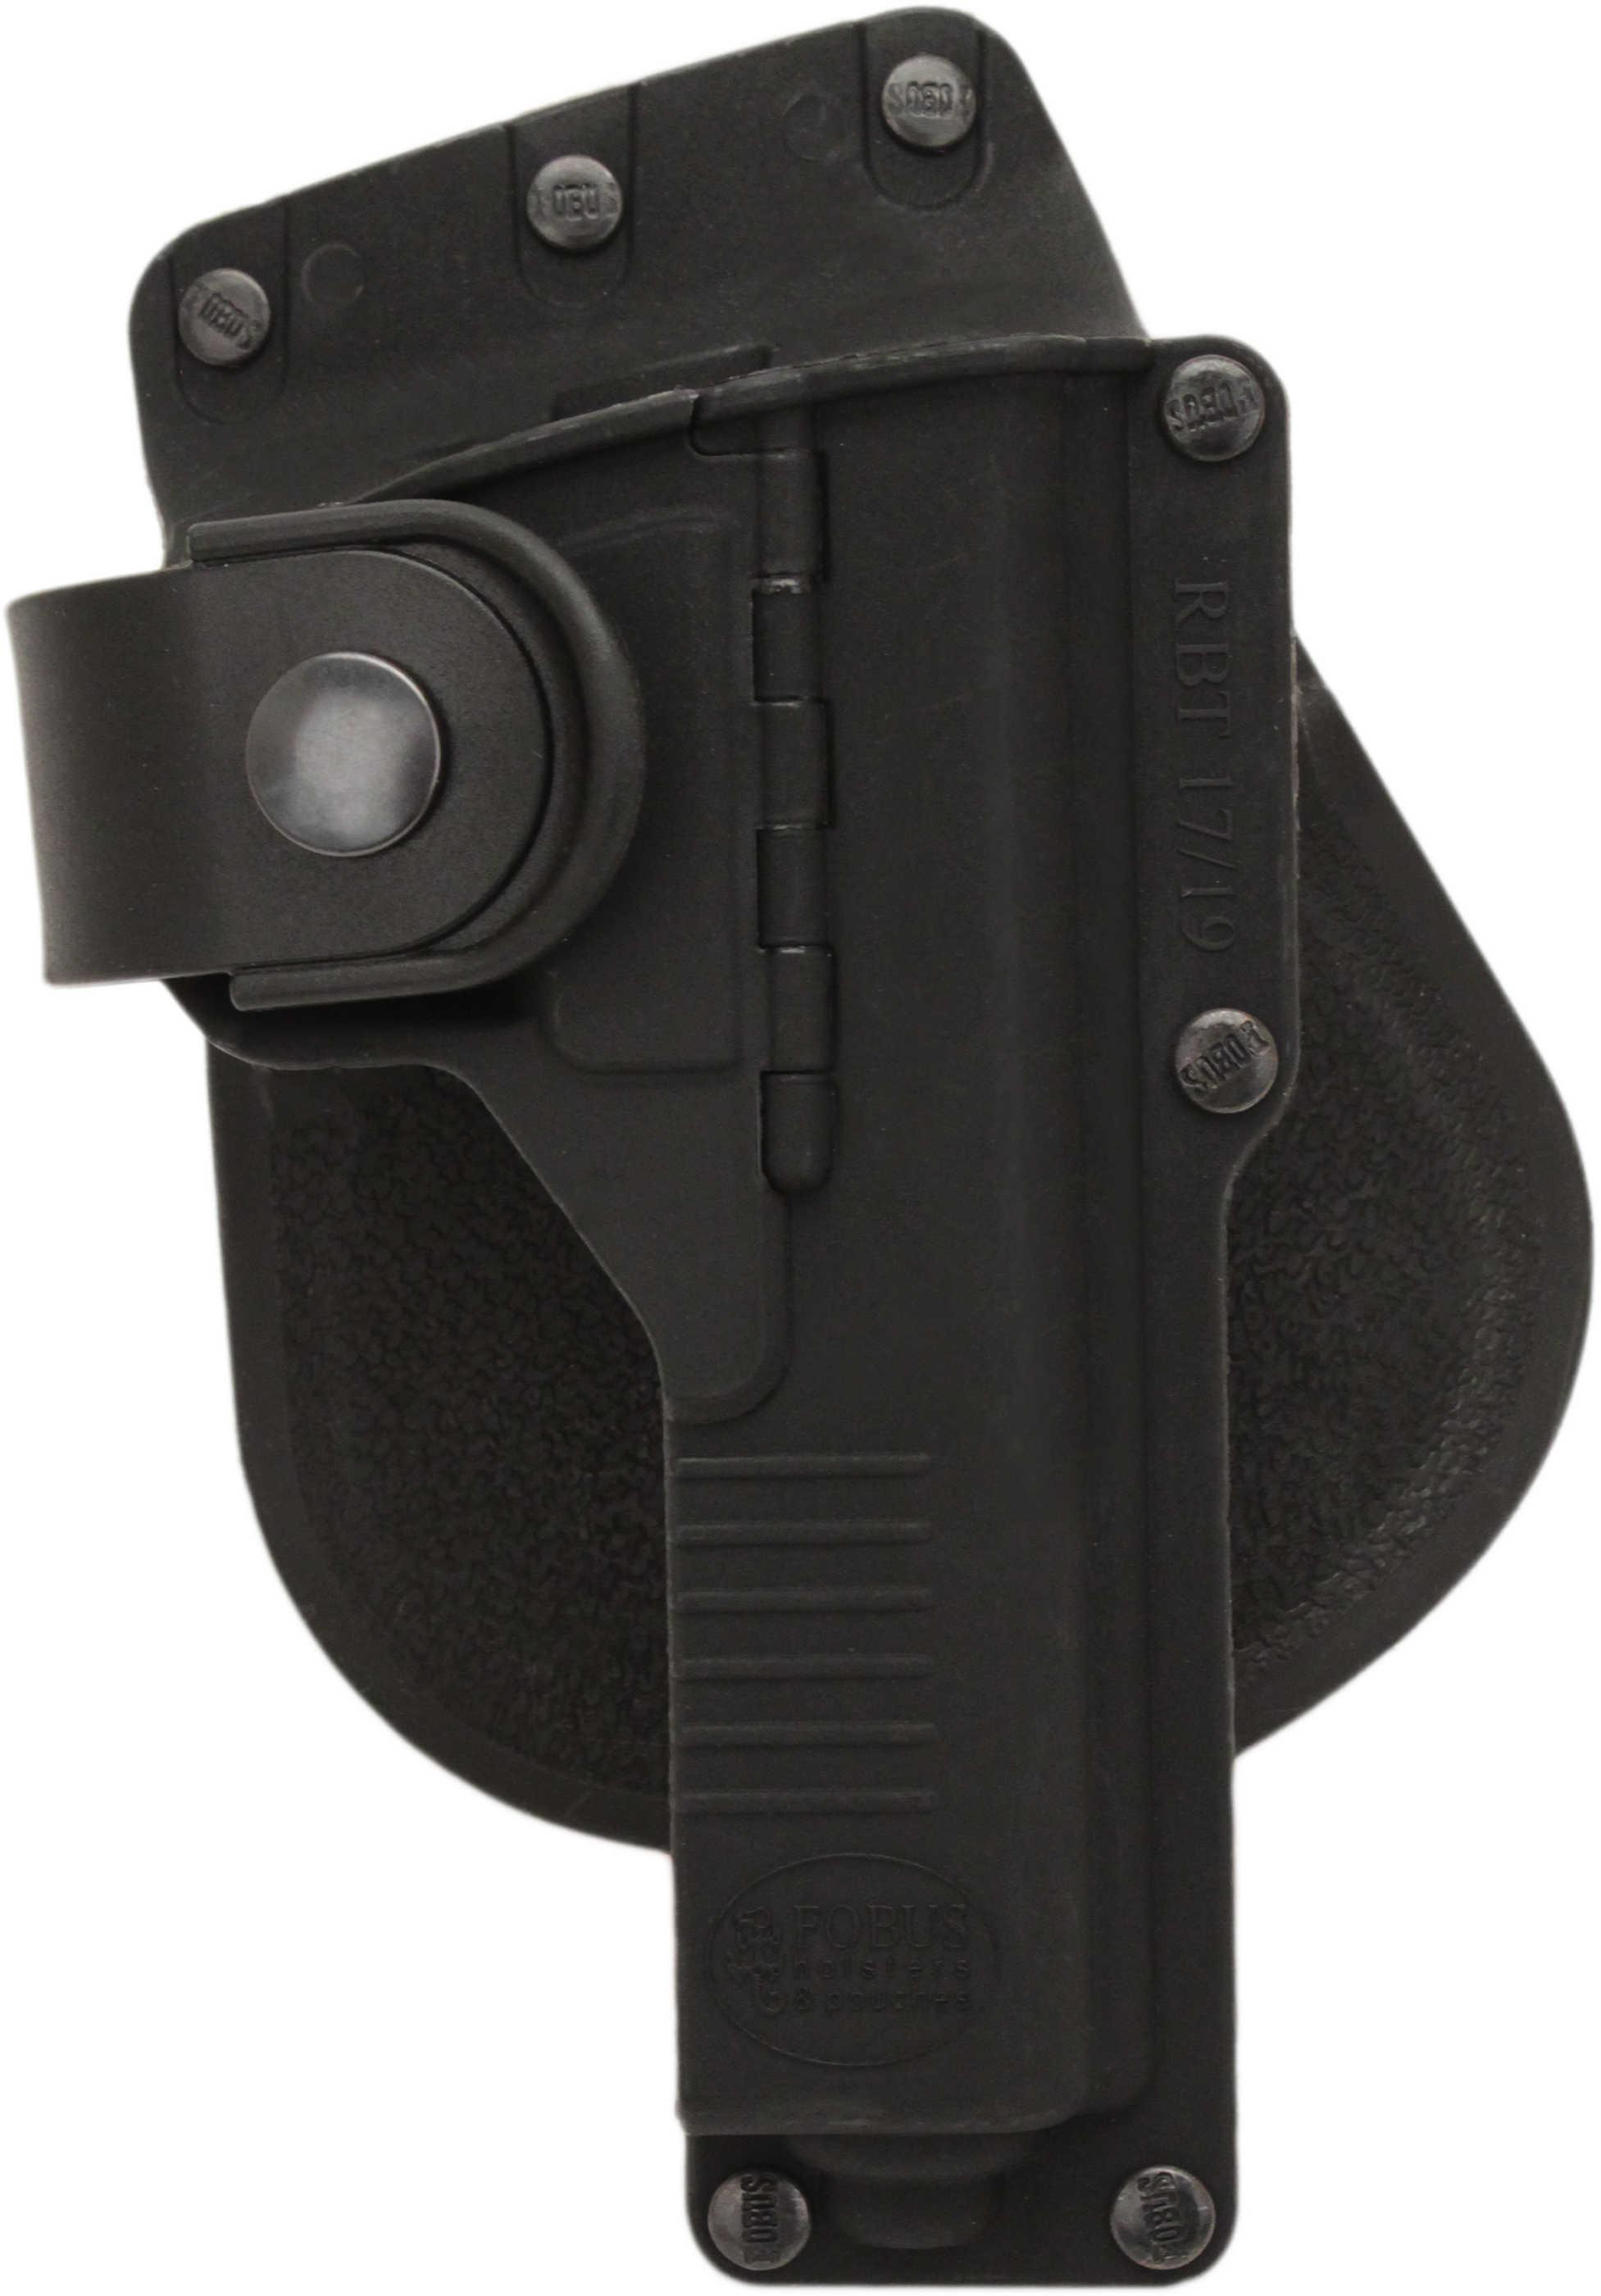 Fobus Glock 17/22/31 w/Laser/Light Hinged Paddle Md: RBT17